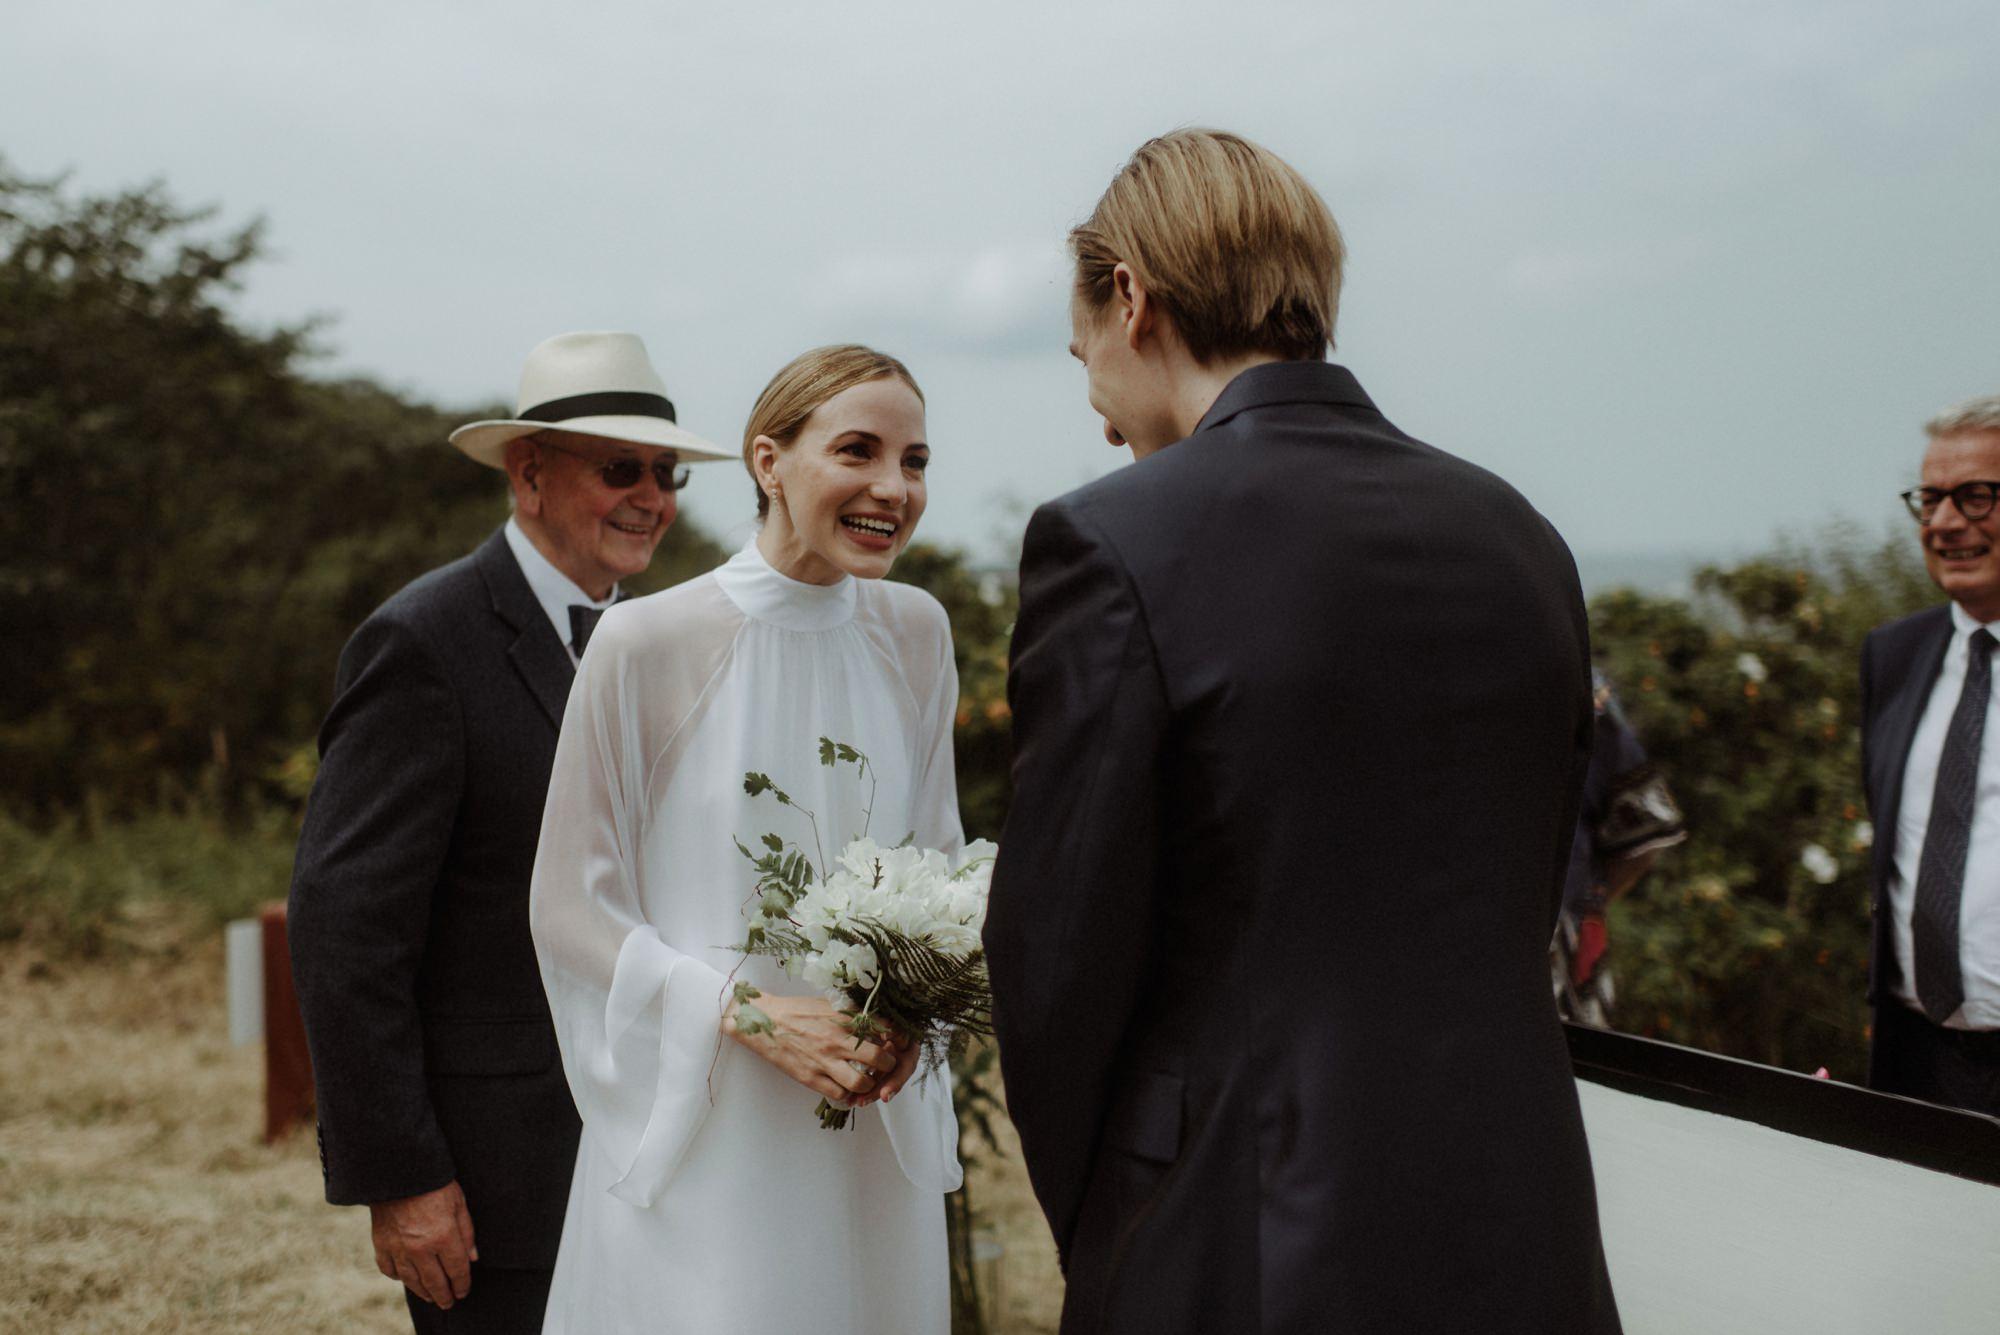 copenhagen wedding photography 0010 1